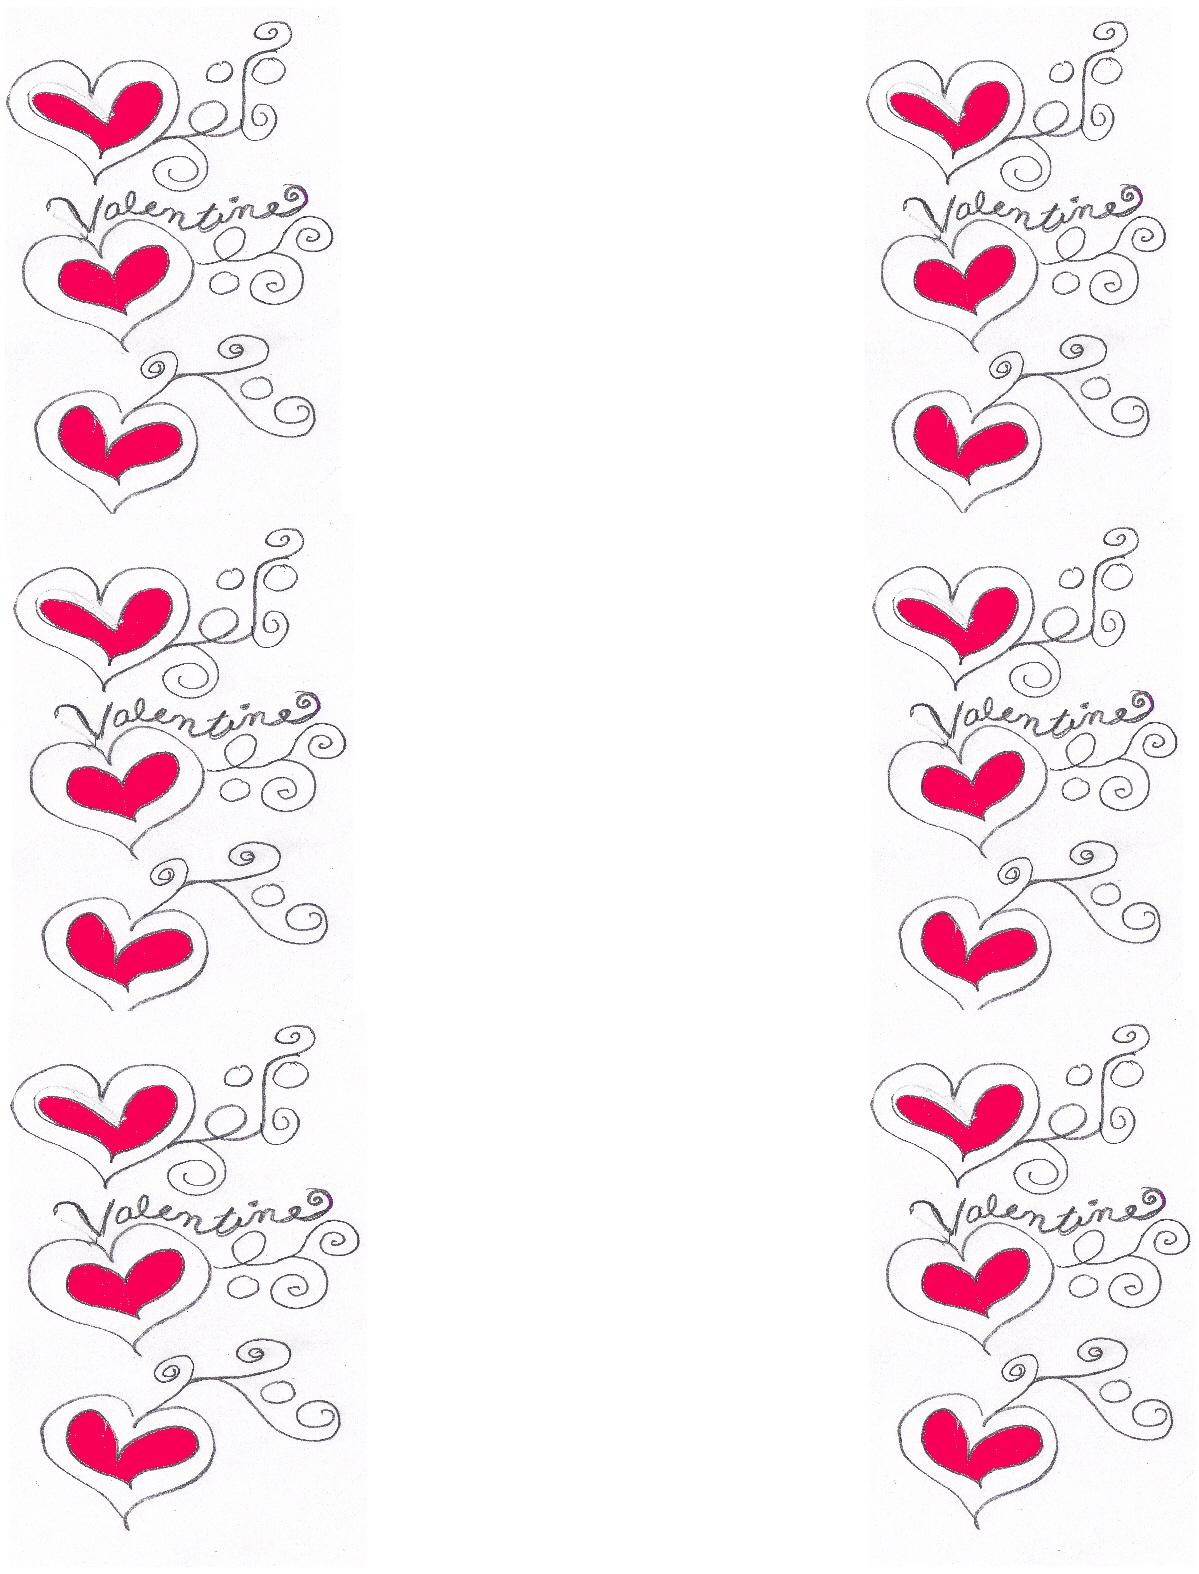 77 Free Printable Valentine Stationery Borders Design Corral